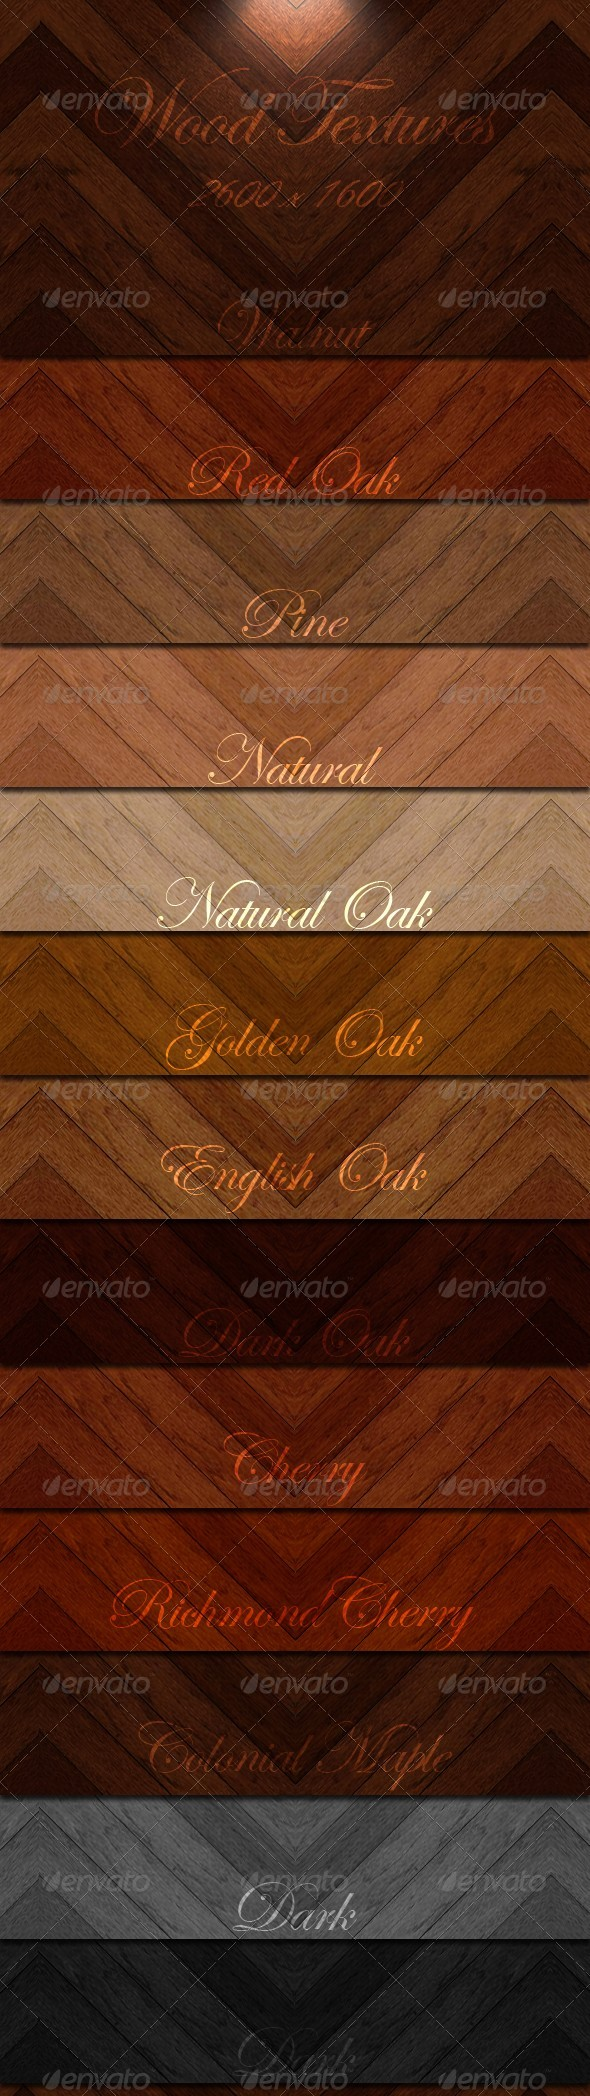 Wood Textures Set-2 - Wood Textures